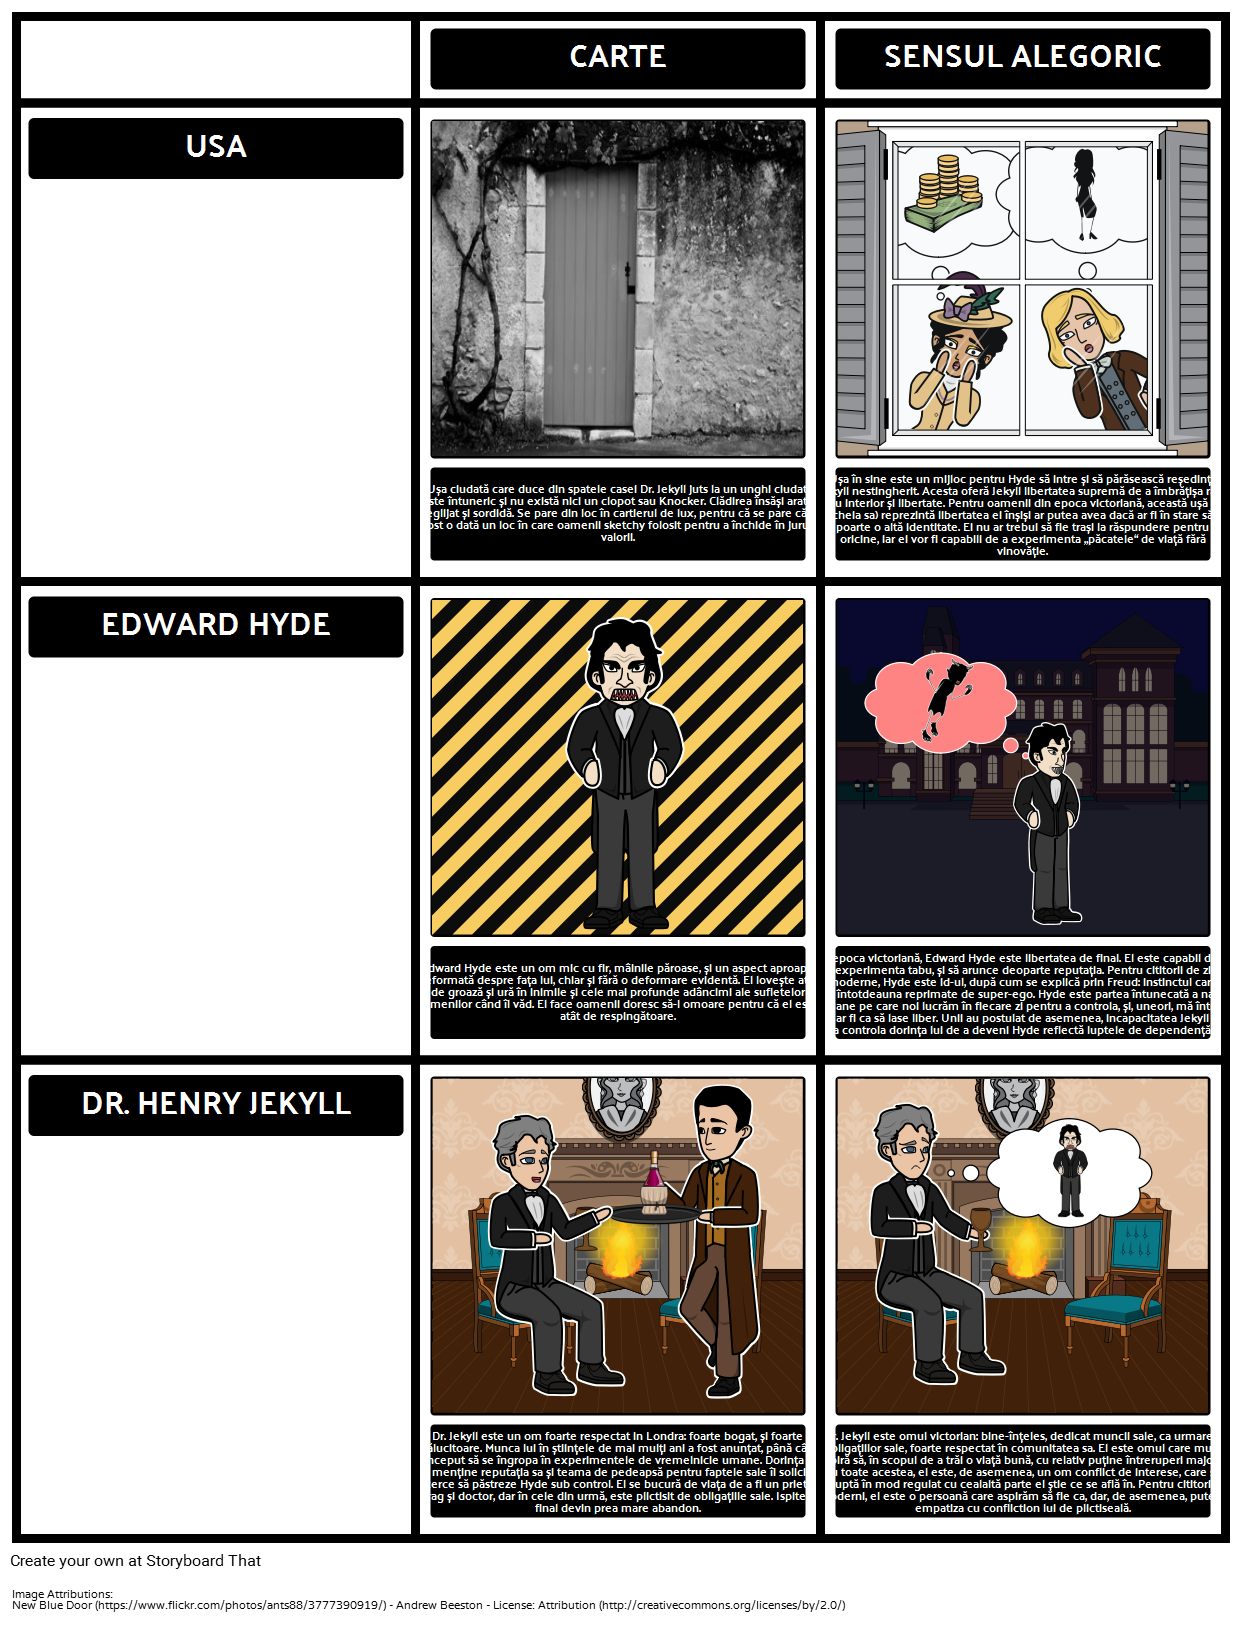 Alegorie în Dr. Jekyll și Mr. Hyde